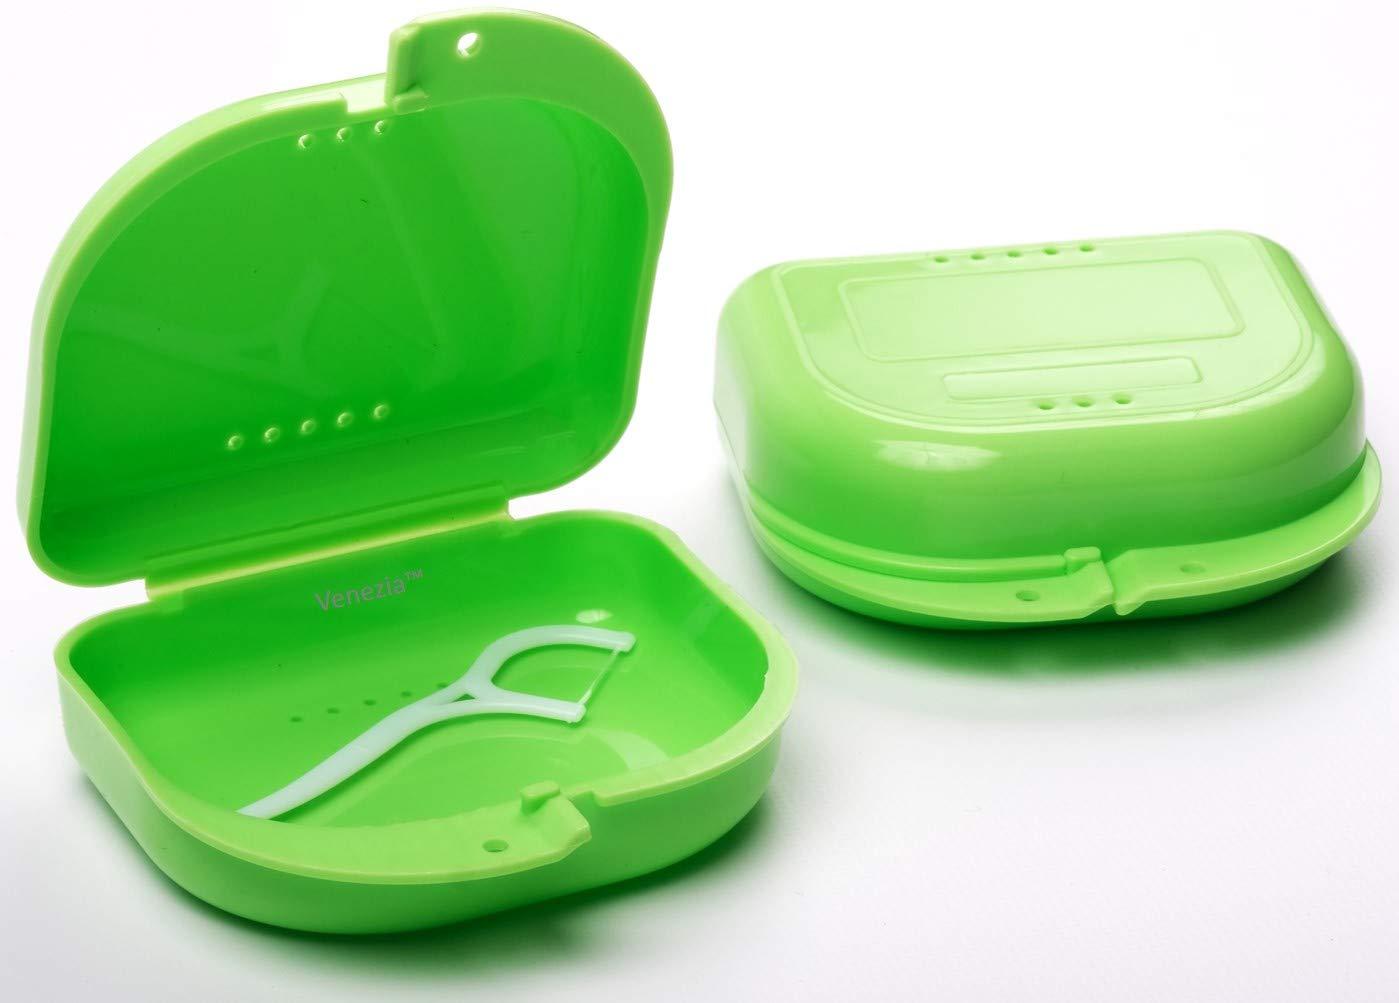 Teethology Caja para Guardabarros con ventilación - Caja para Guardabarros ortodonciales - Delgada Caja Dental ortodoncia - Caja para dentaduras: Amazon.es: Hogar